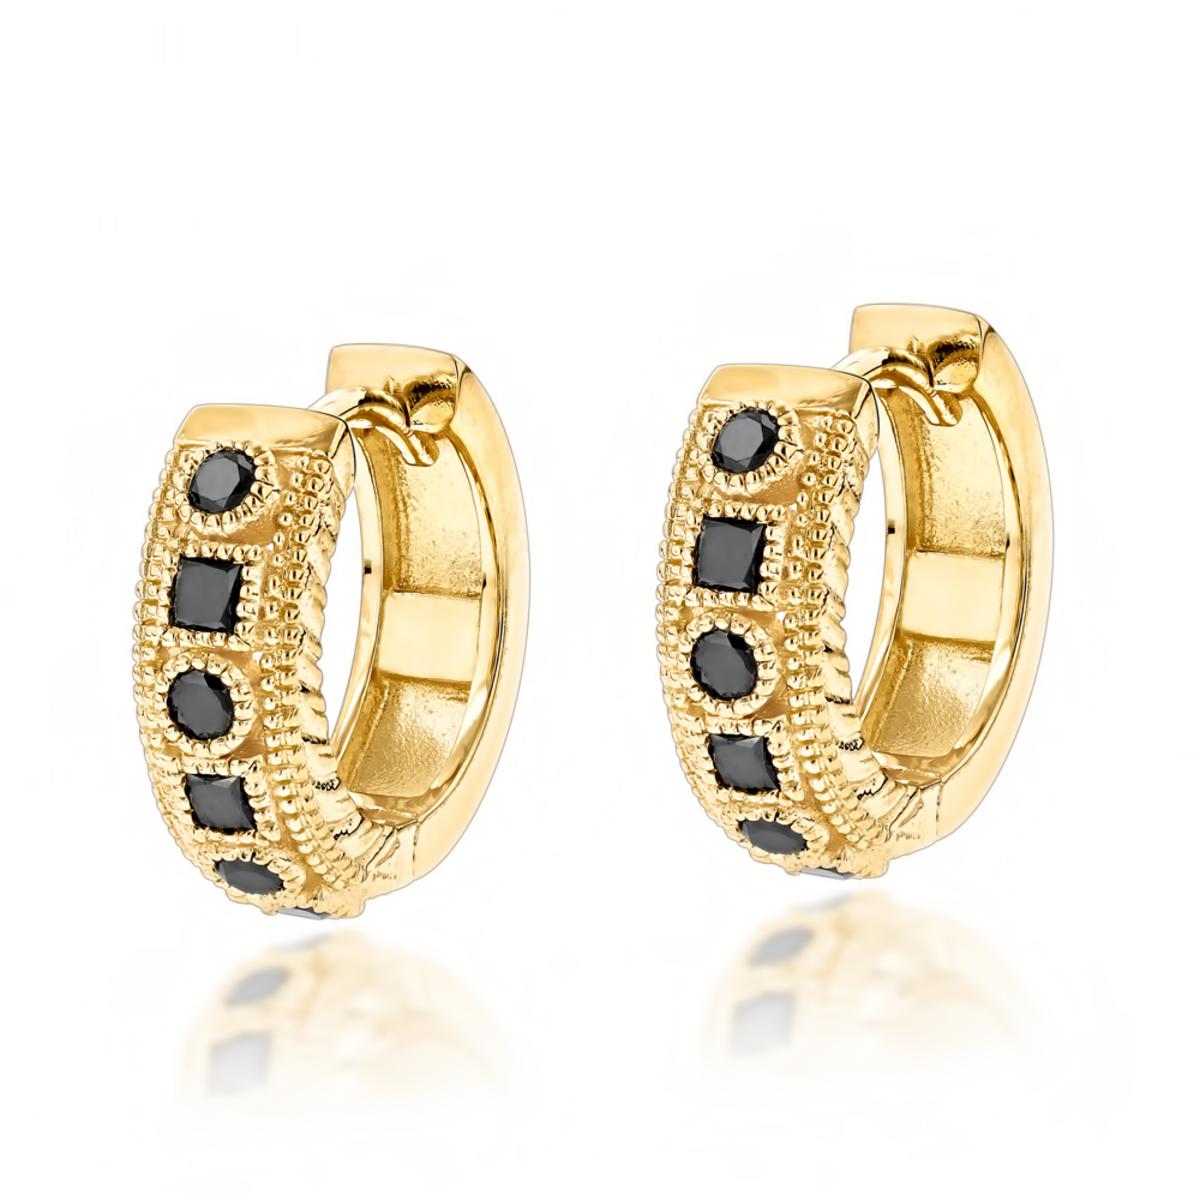 Unique Small Diamond Hoop Earring: Black Diamond Huggies in 14k Gold ...